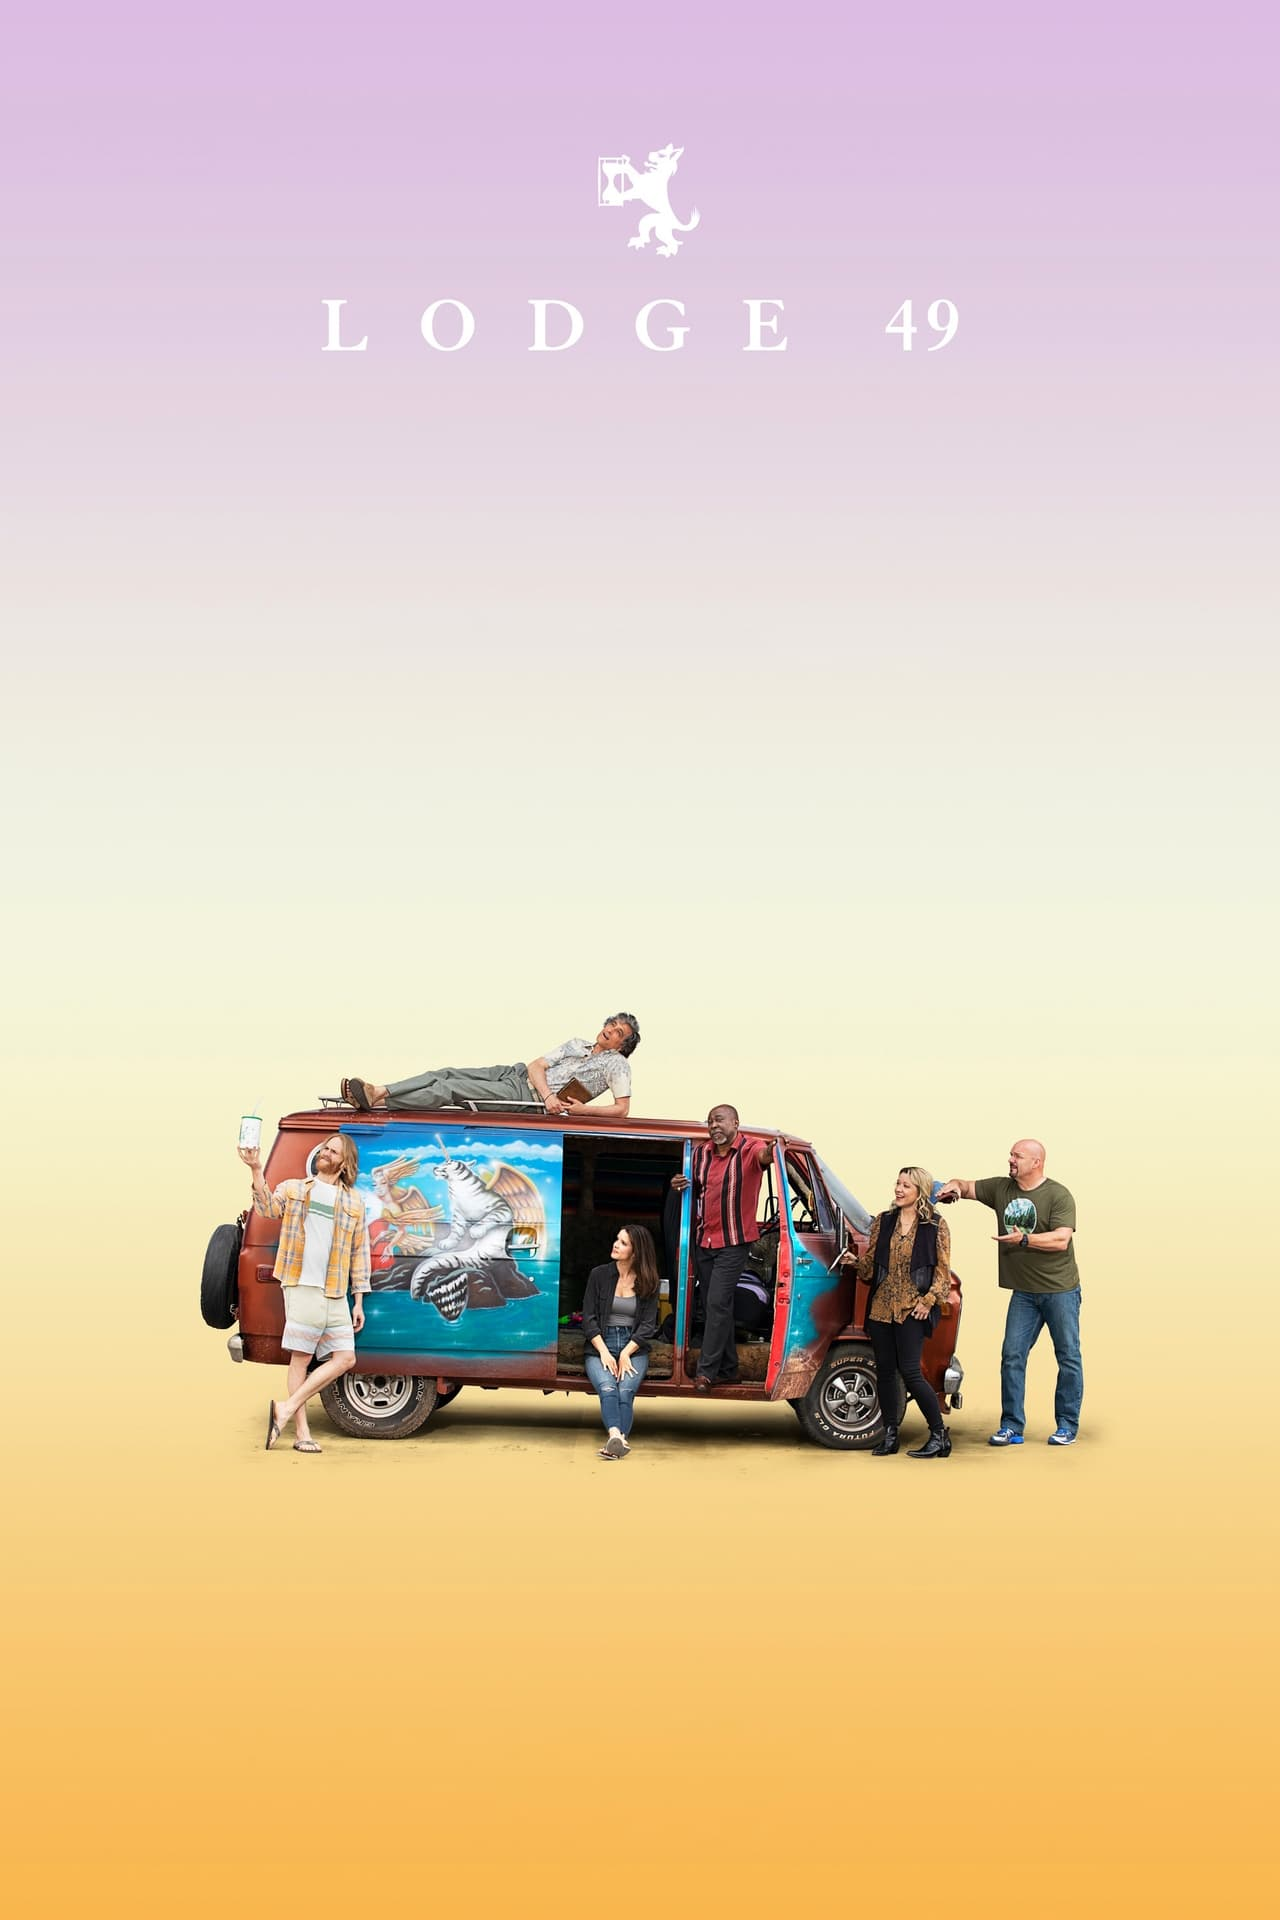 Download Lodge 49 (Season 1) Dual Audio [Hindi-English] 720p WeB-DL HD [350MB]